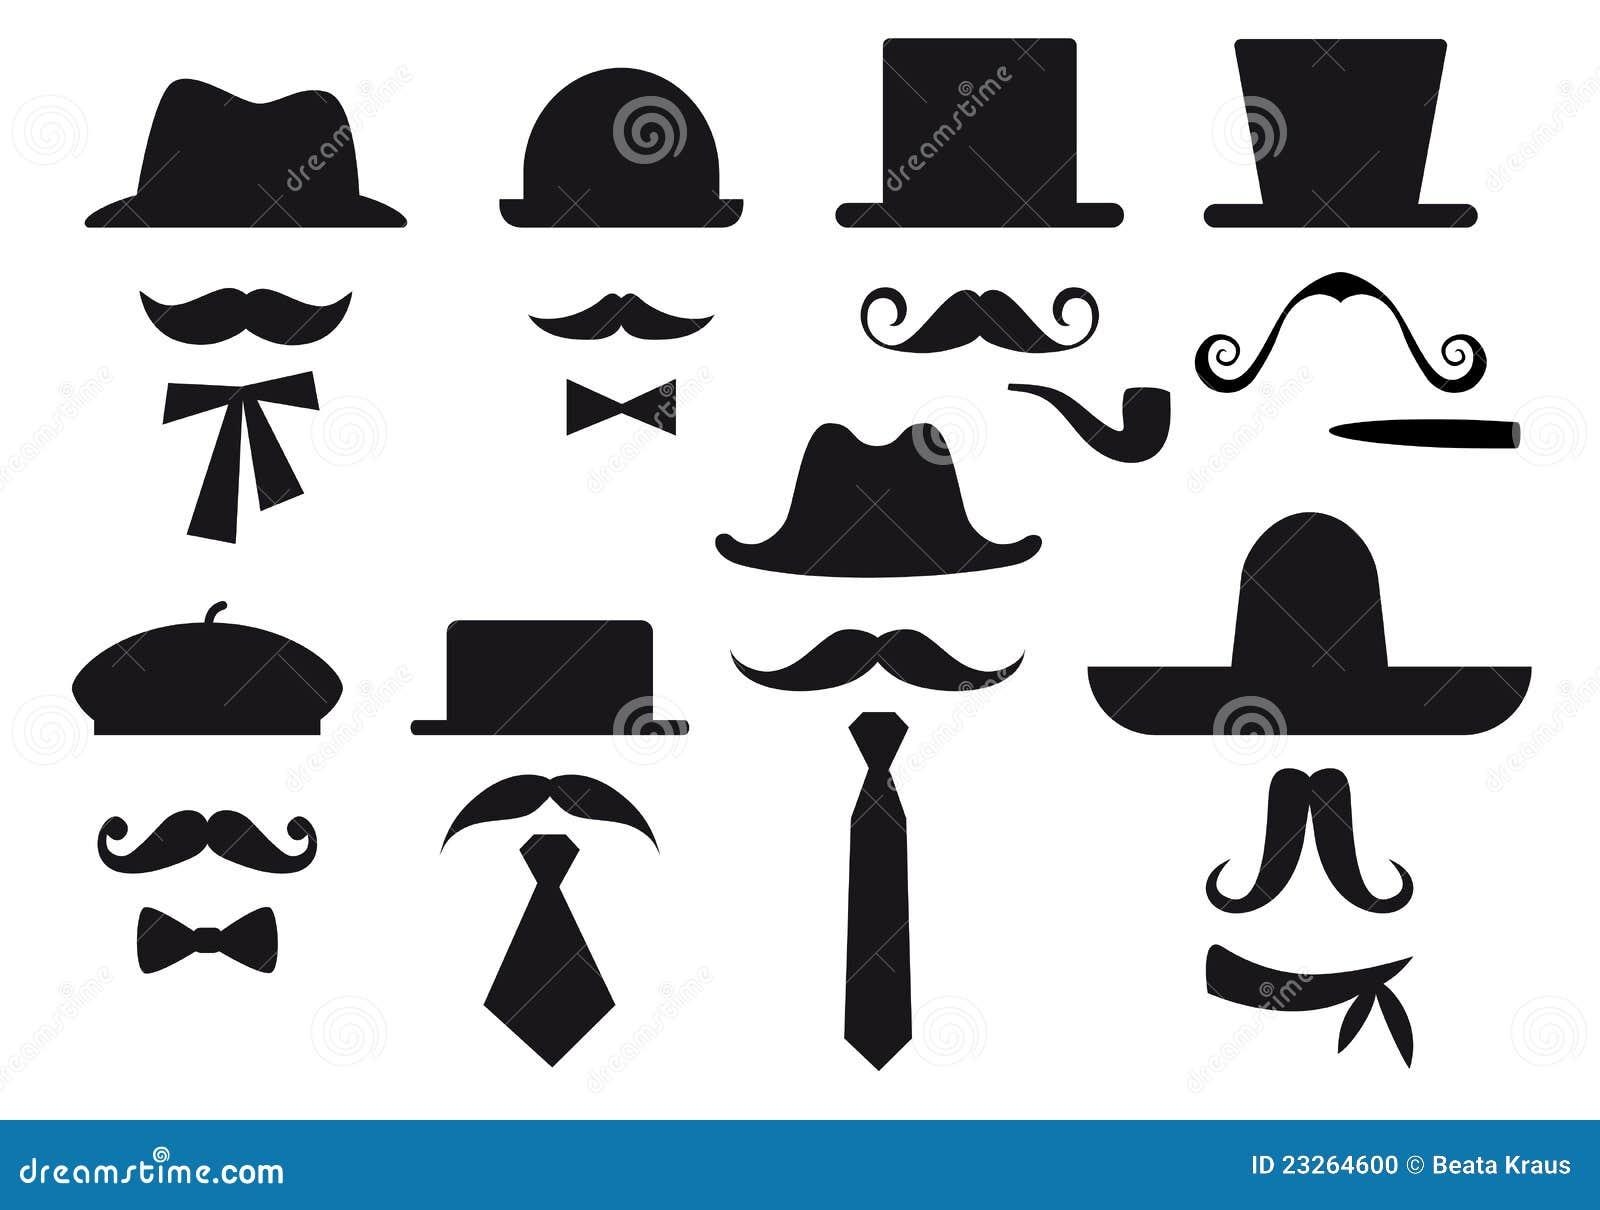 Moustache e chapéus, jogo do vetor